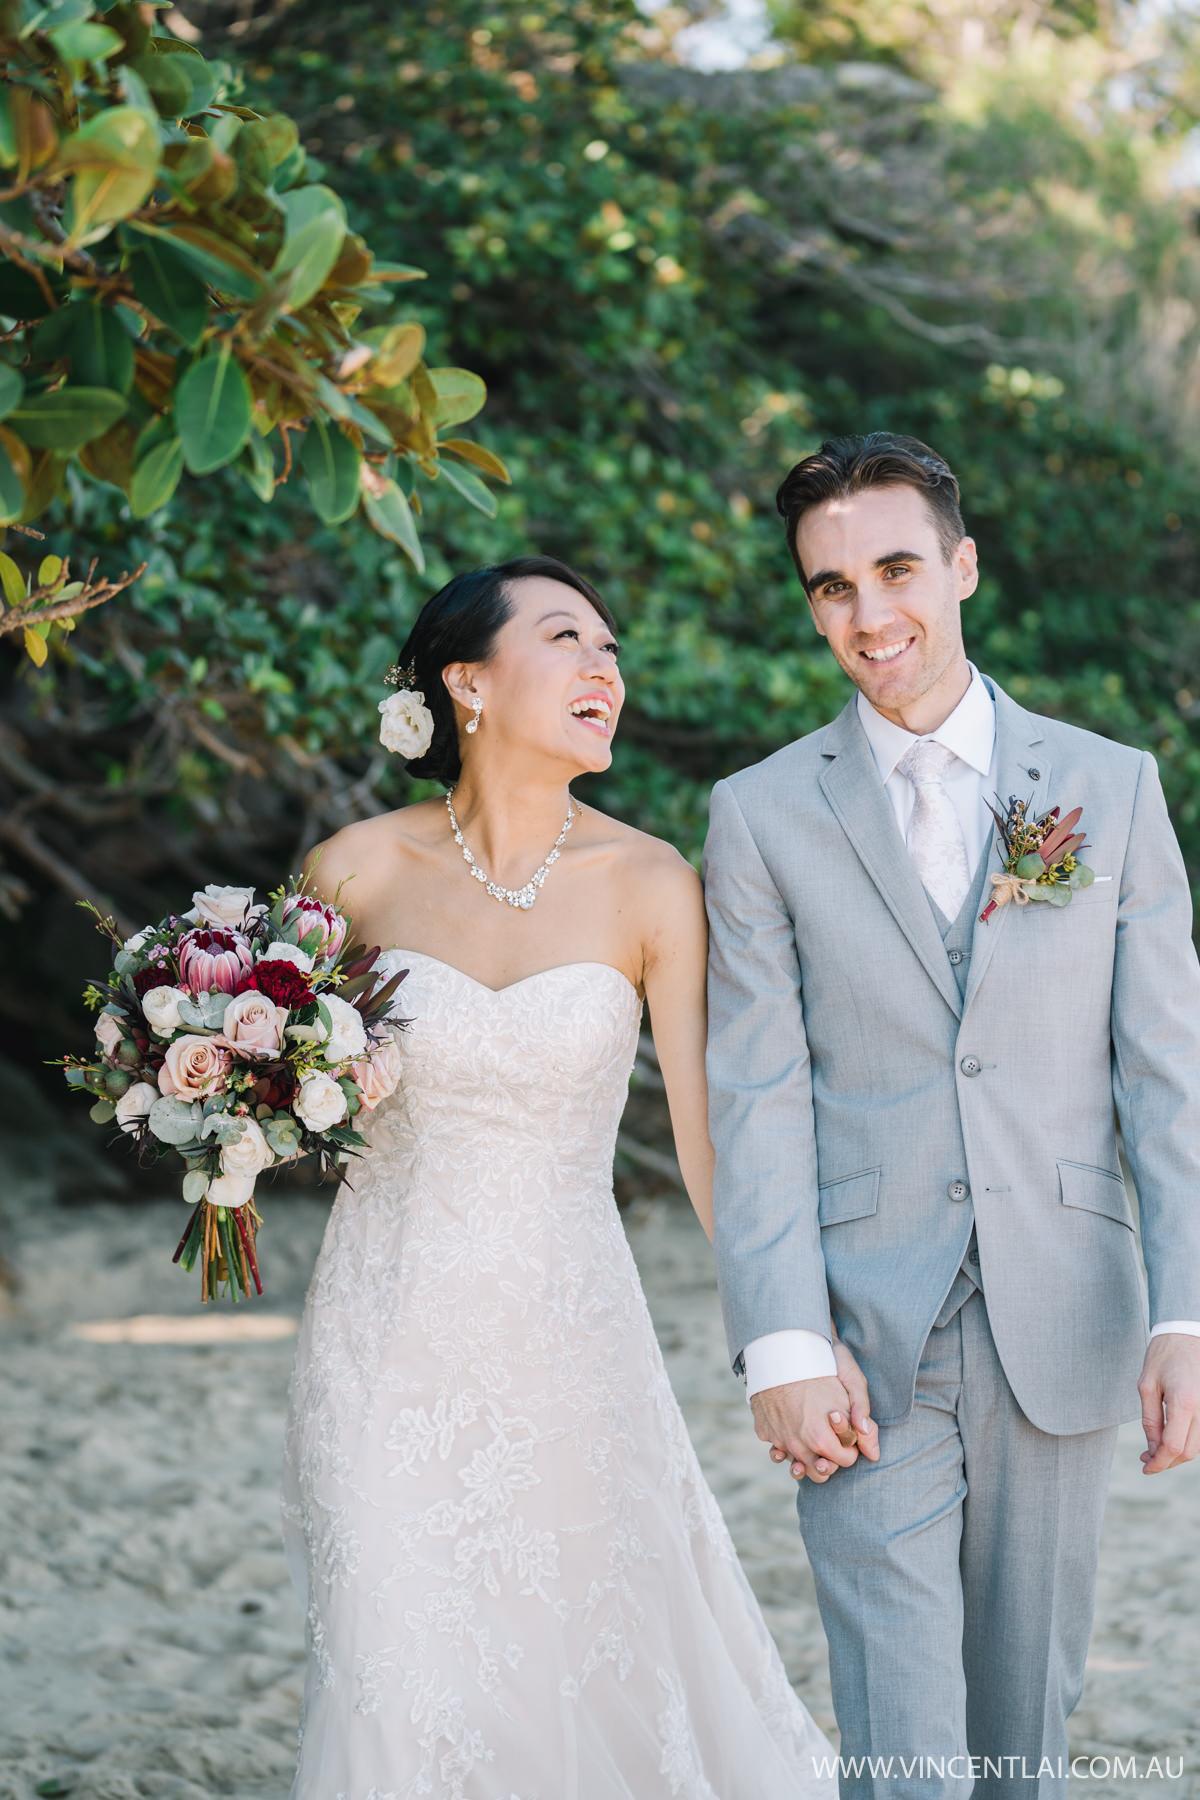 Bradleys Head Amphitheatre Wedding Photo